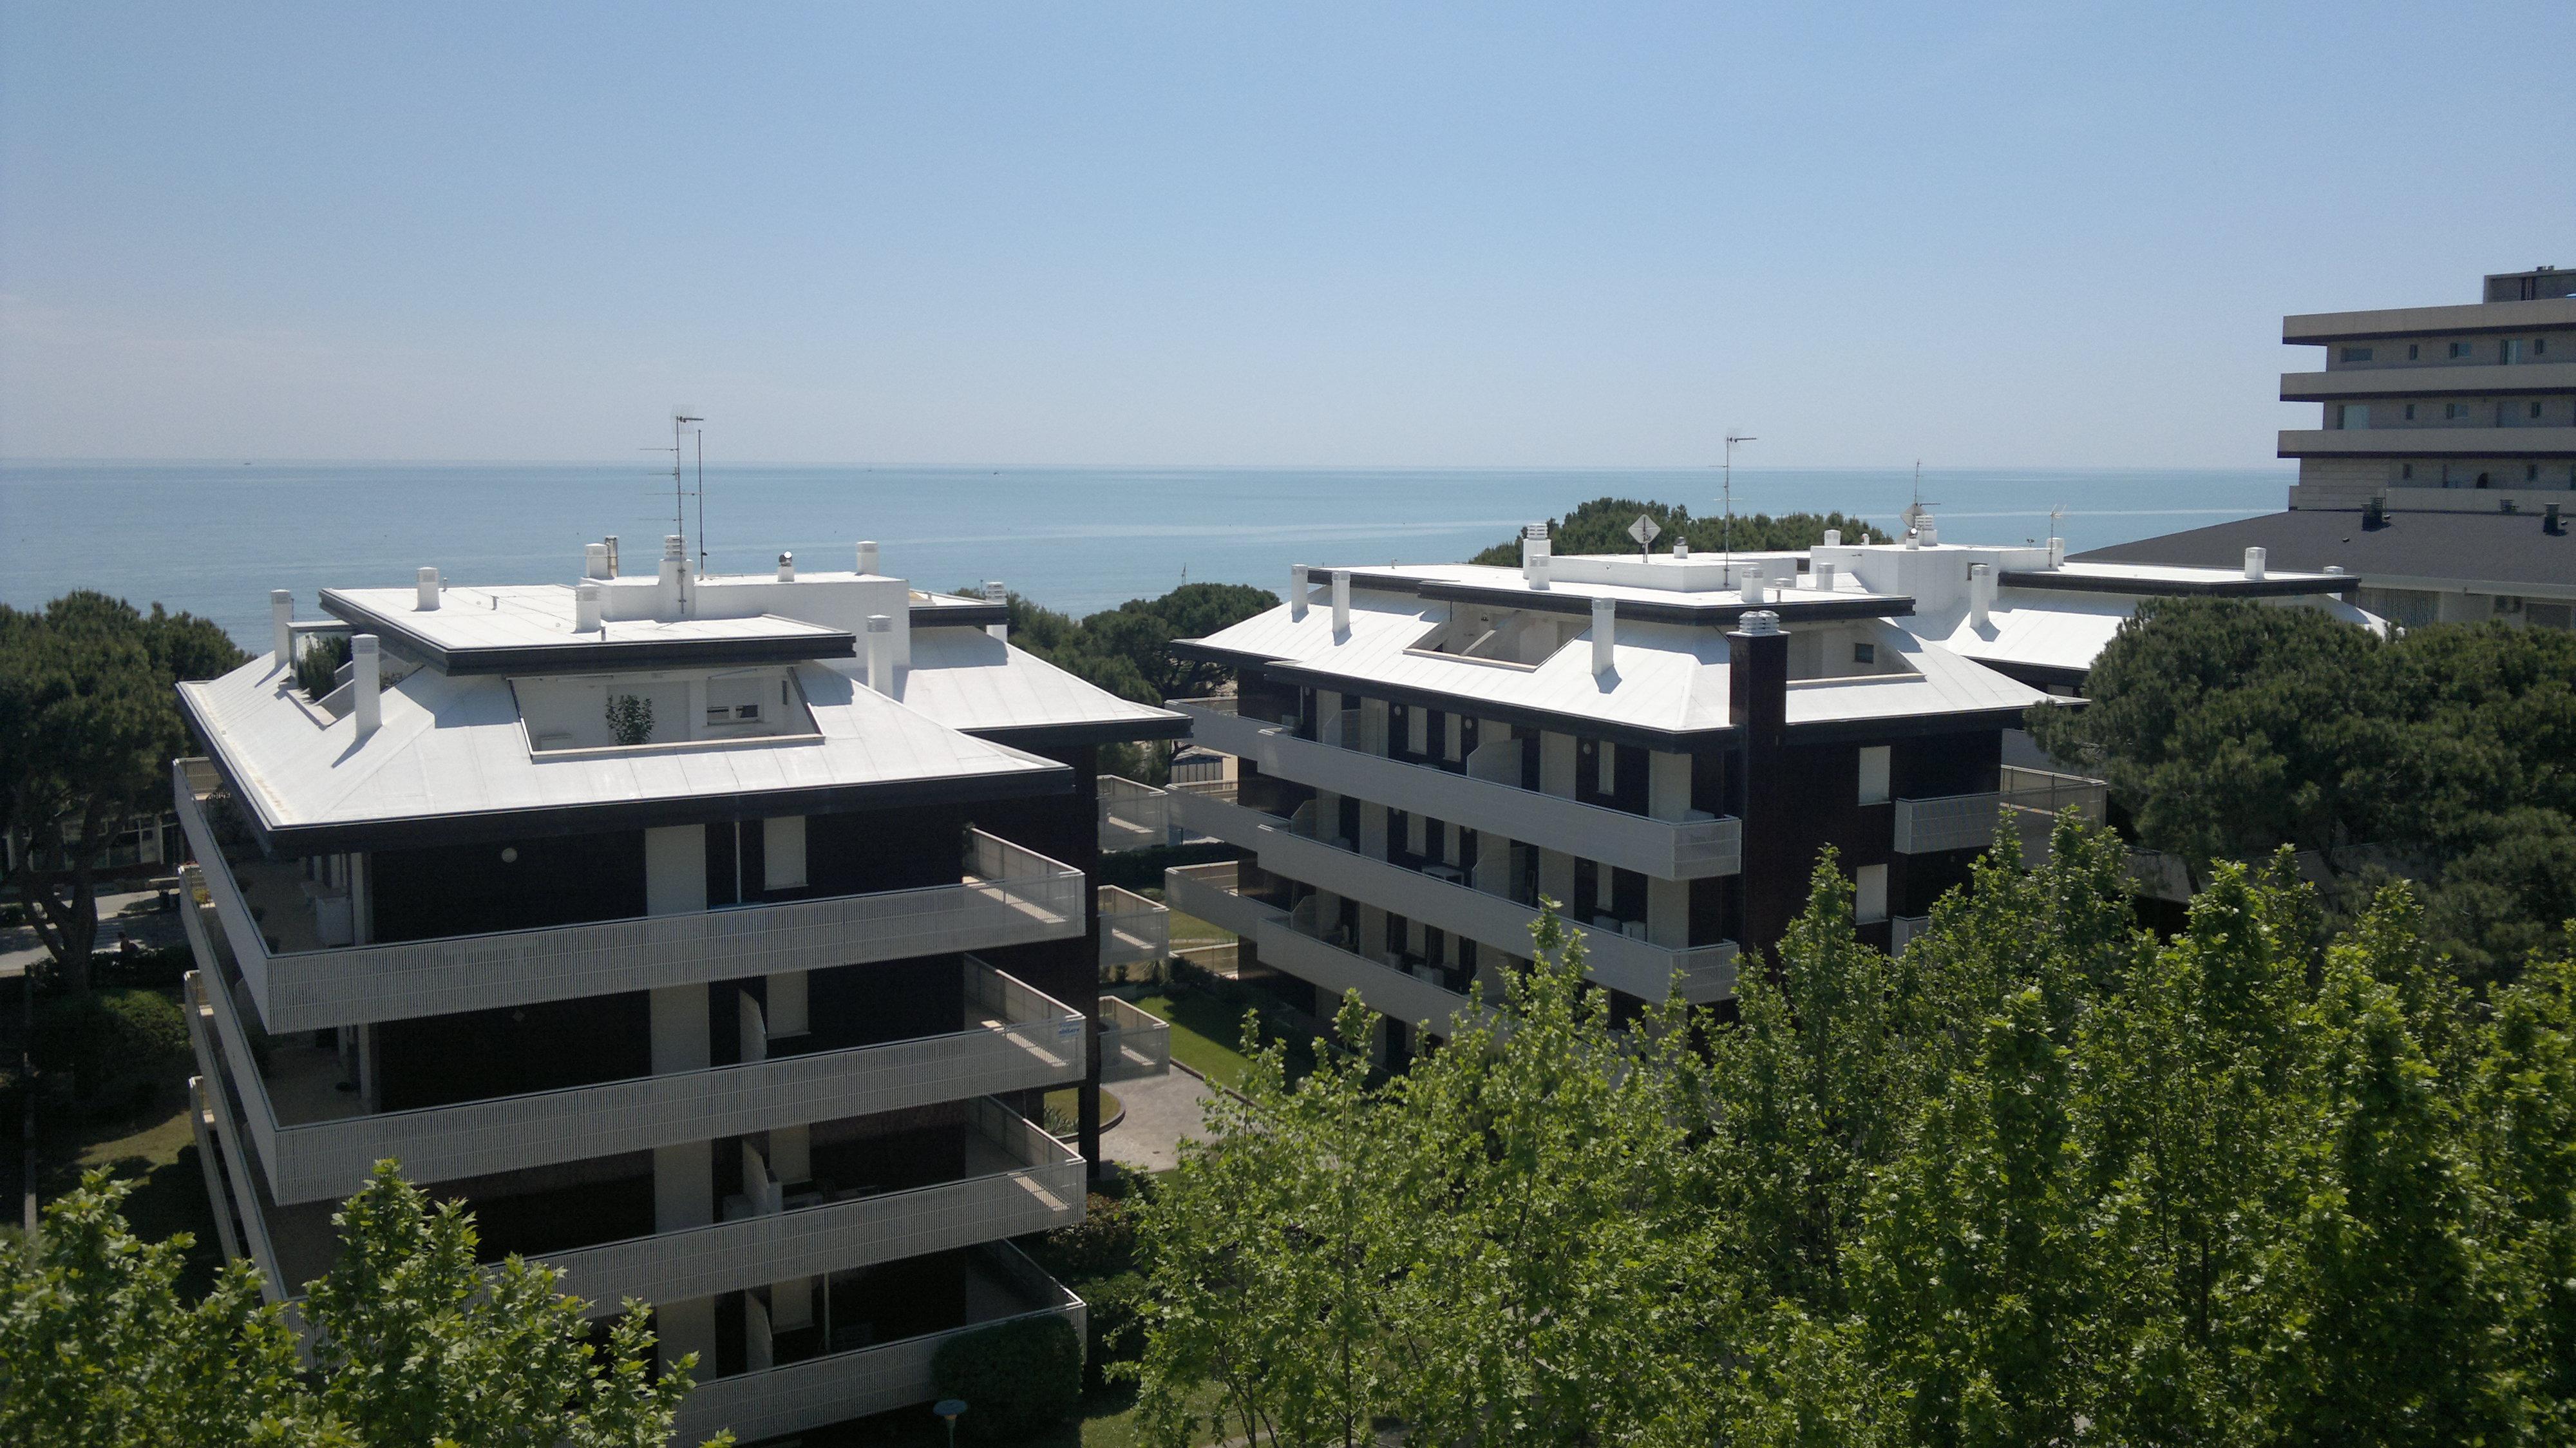 Toiture blanche Villa Doimo - Lignagno Sabbia d'Oro UD Italie - Derbigum